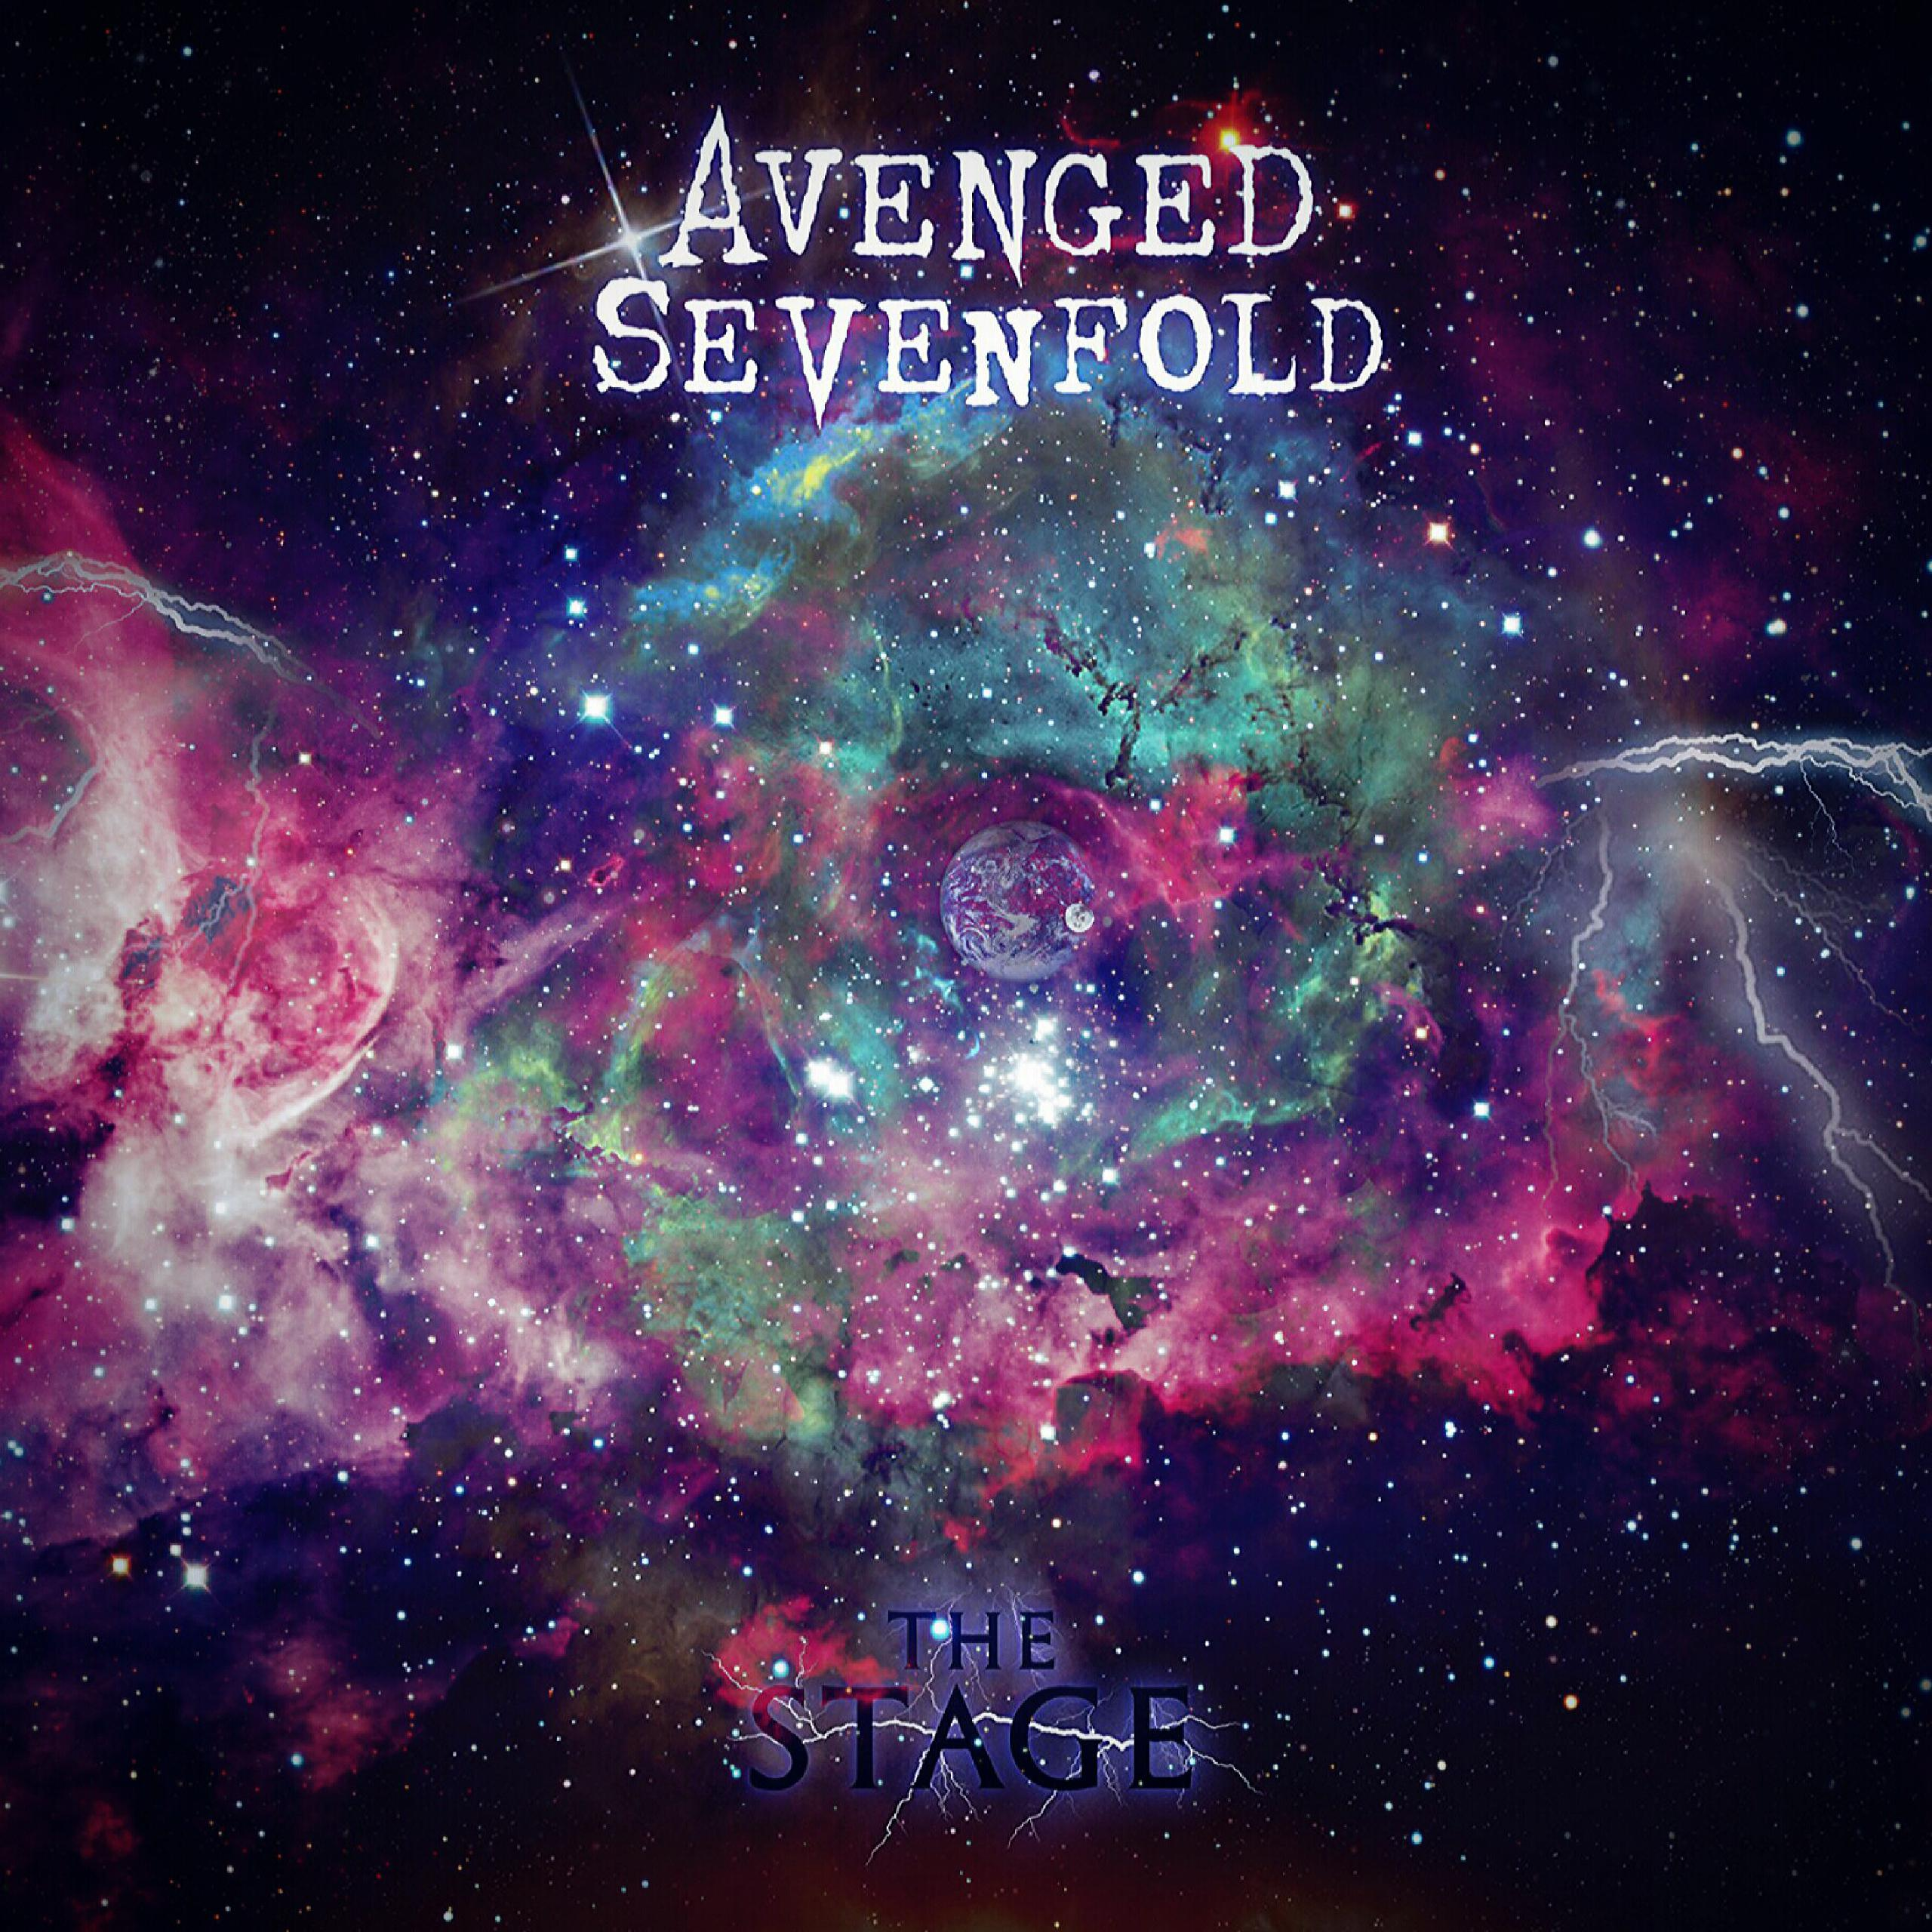 Avenged Sevenfold Tour Dates 2019 2020 Avenged Sevenfold Tickets